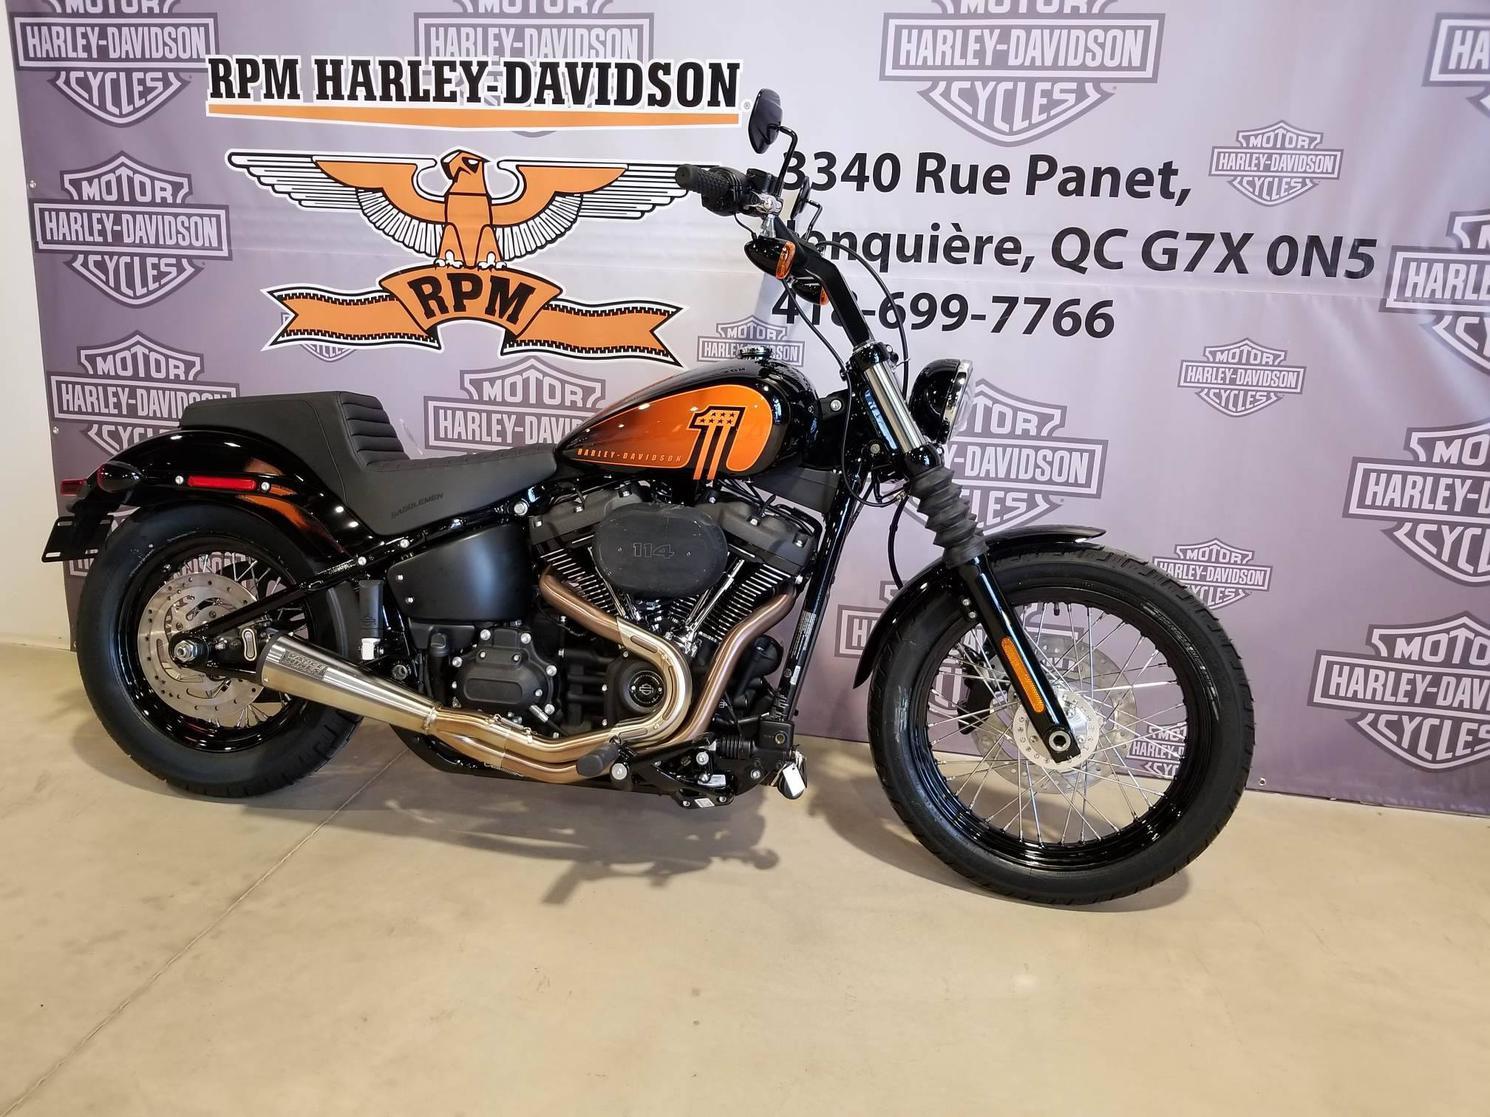 Harley-Davidson Softail Street Bob Club Style - FXBBS 2021